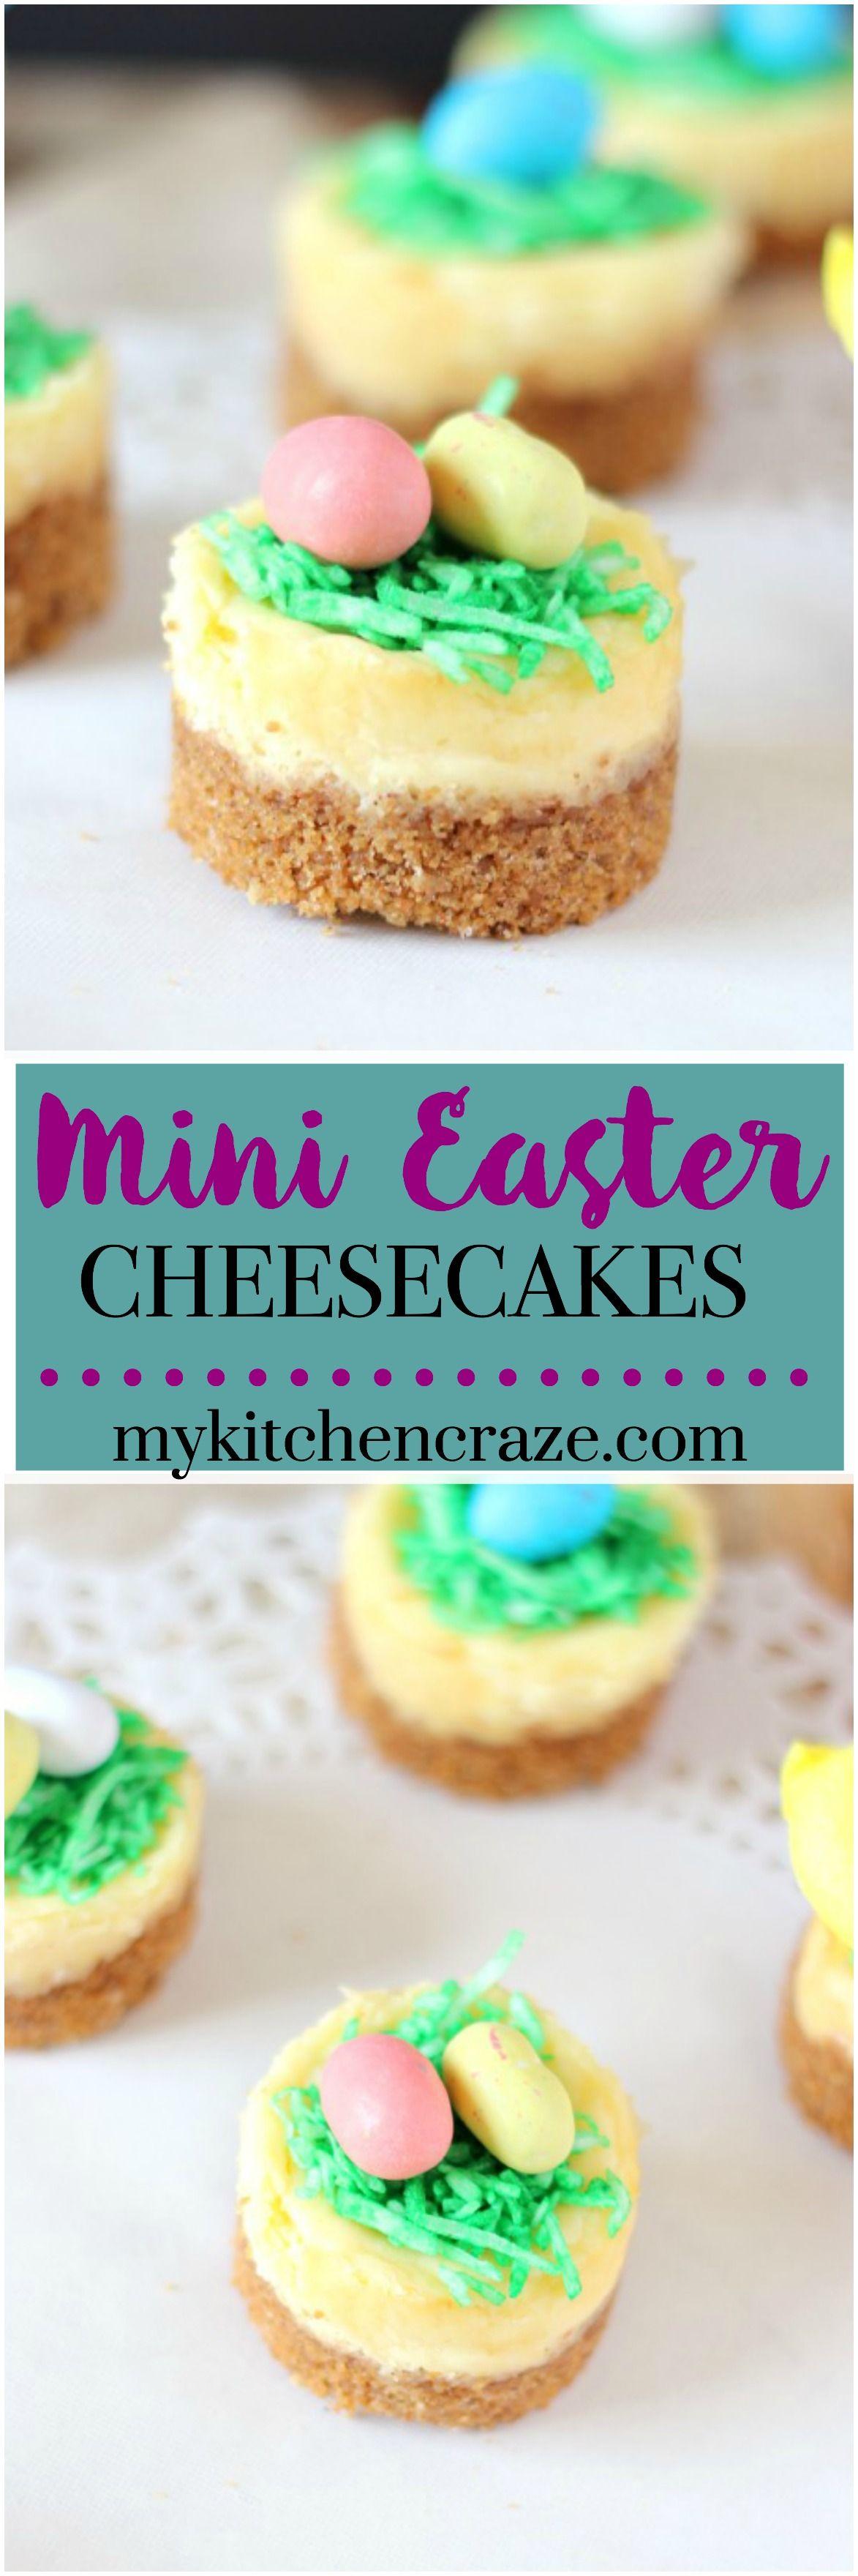 Photo of Mini Easter Cheesecakes – My Kitchen Craze